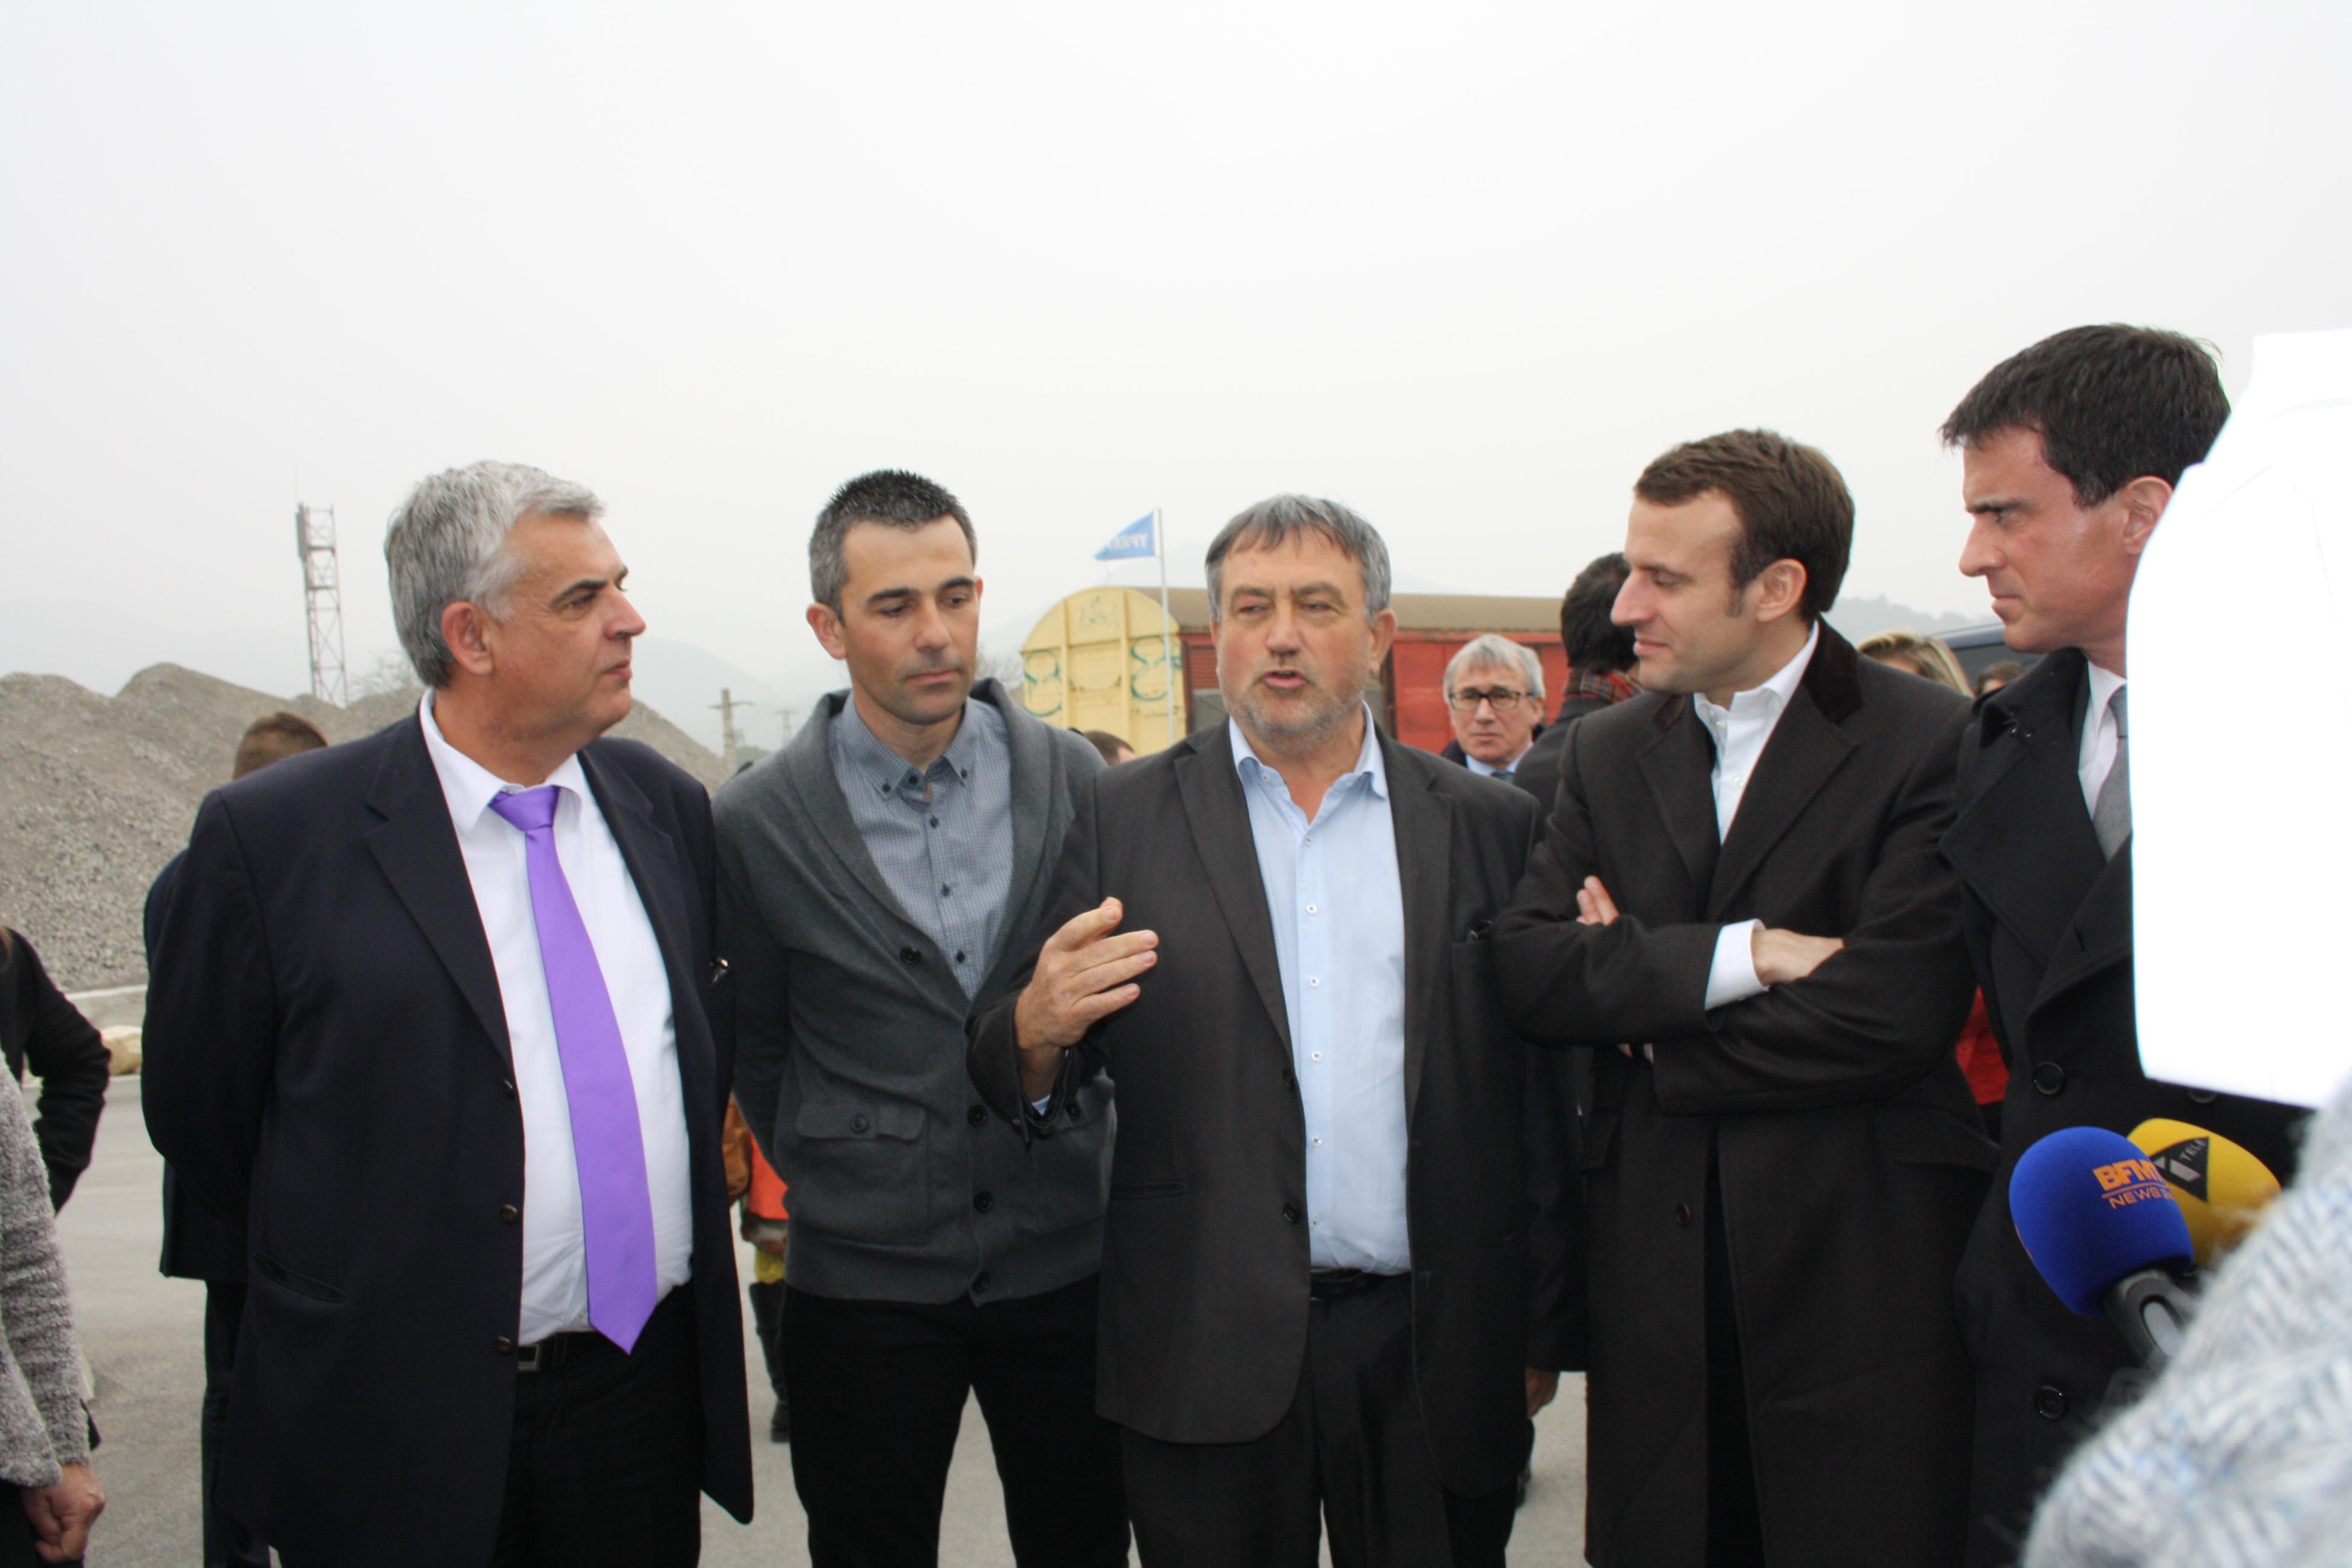 Visite Ministre Mars 2015 (6)